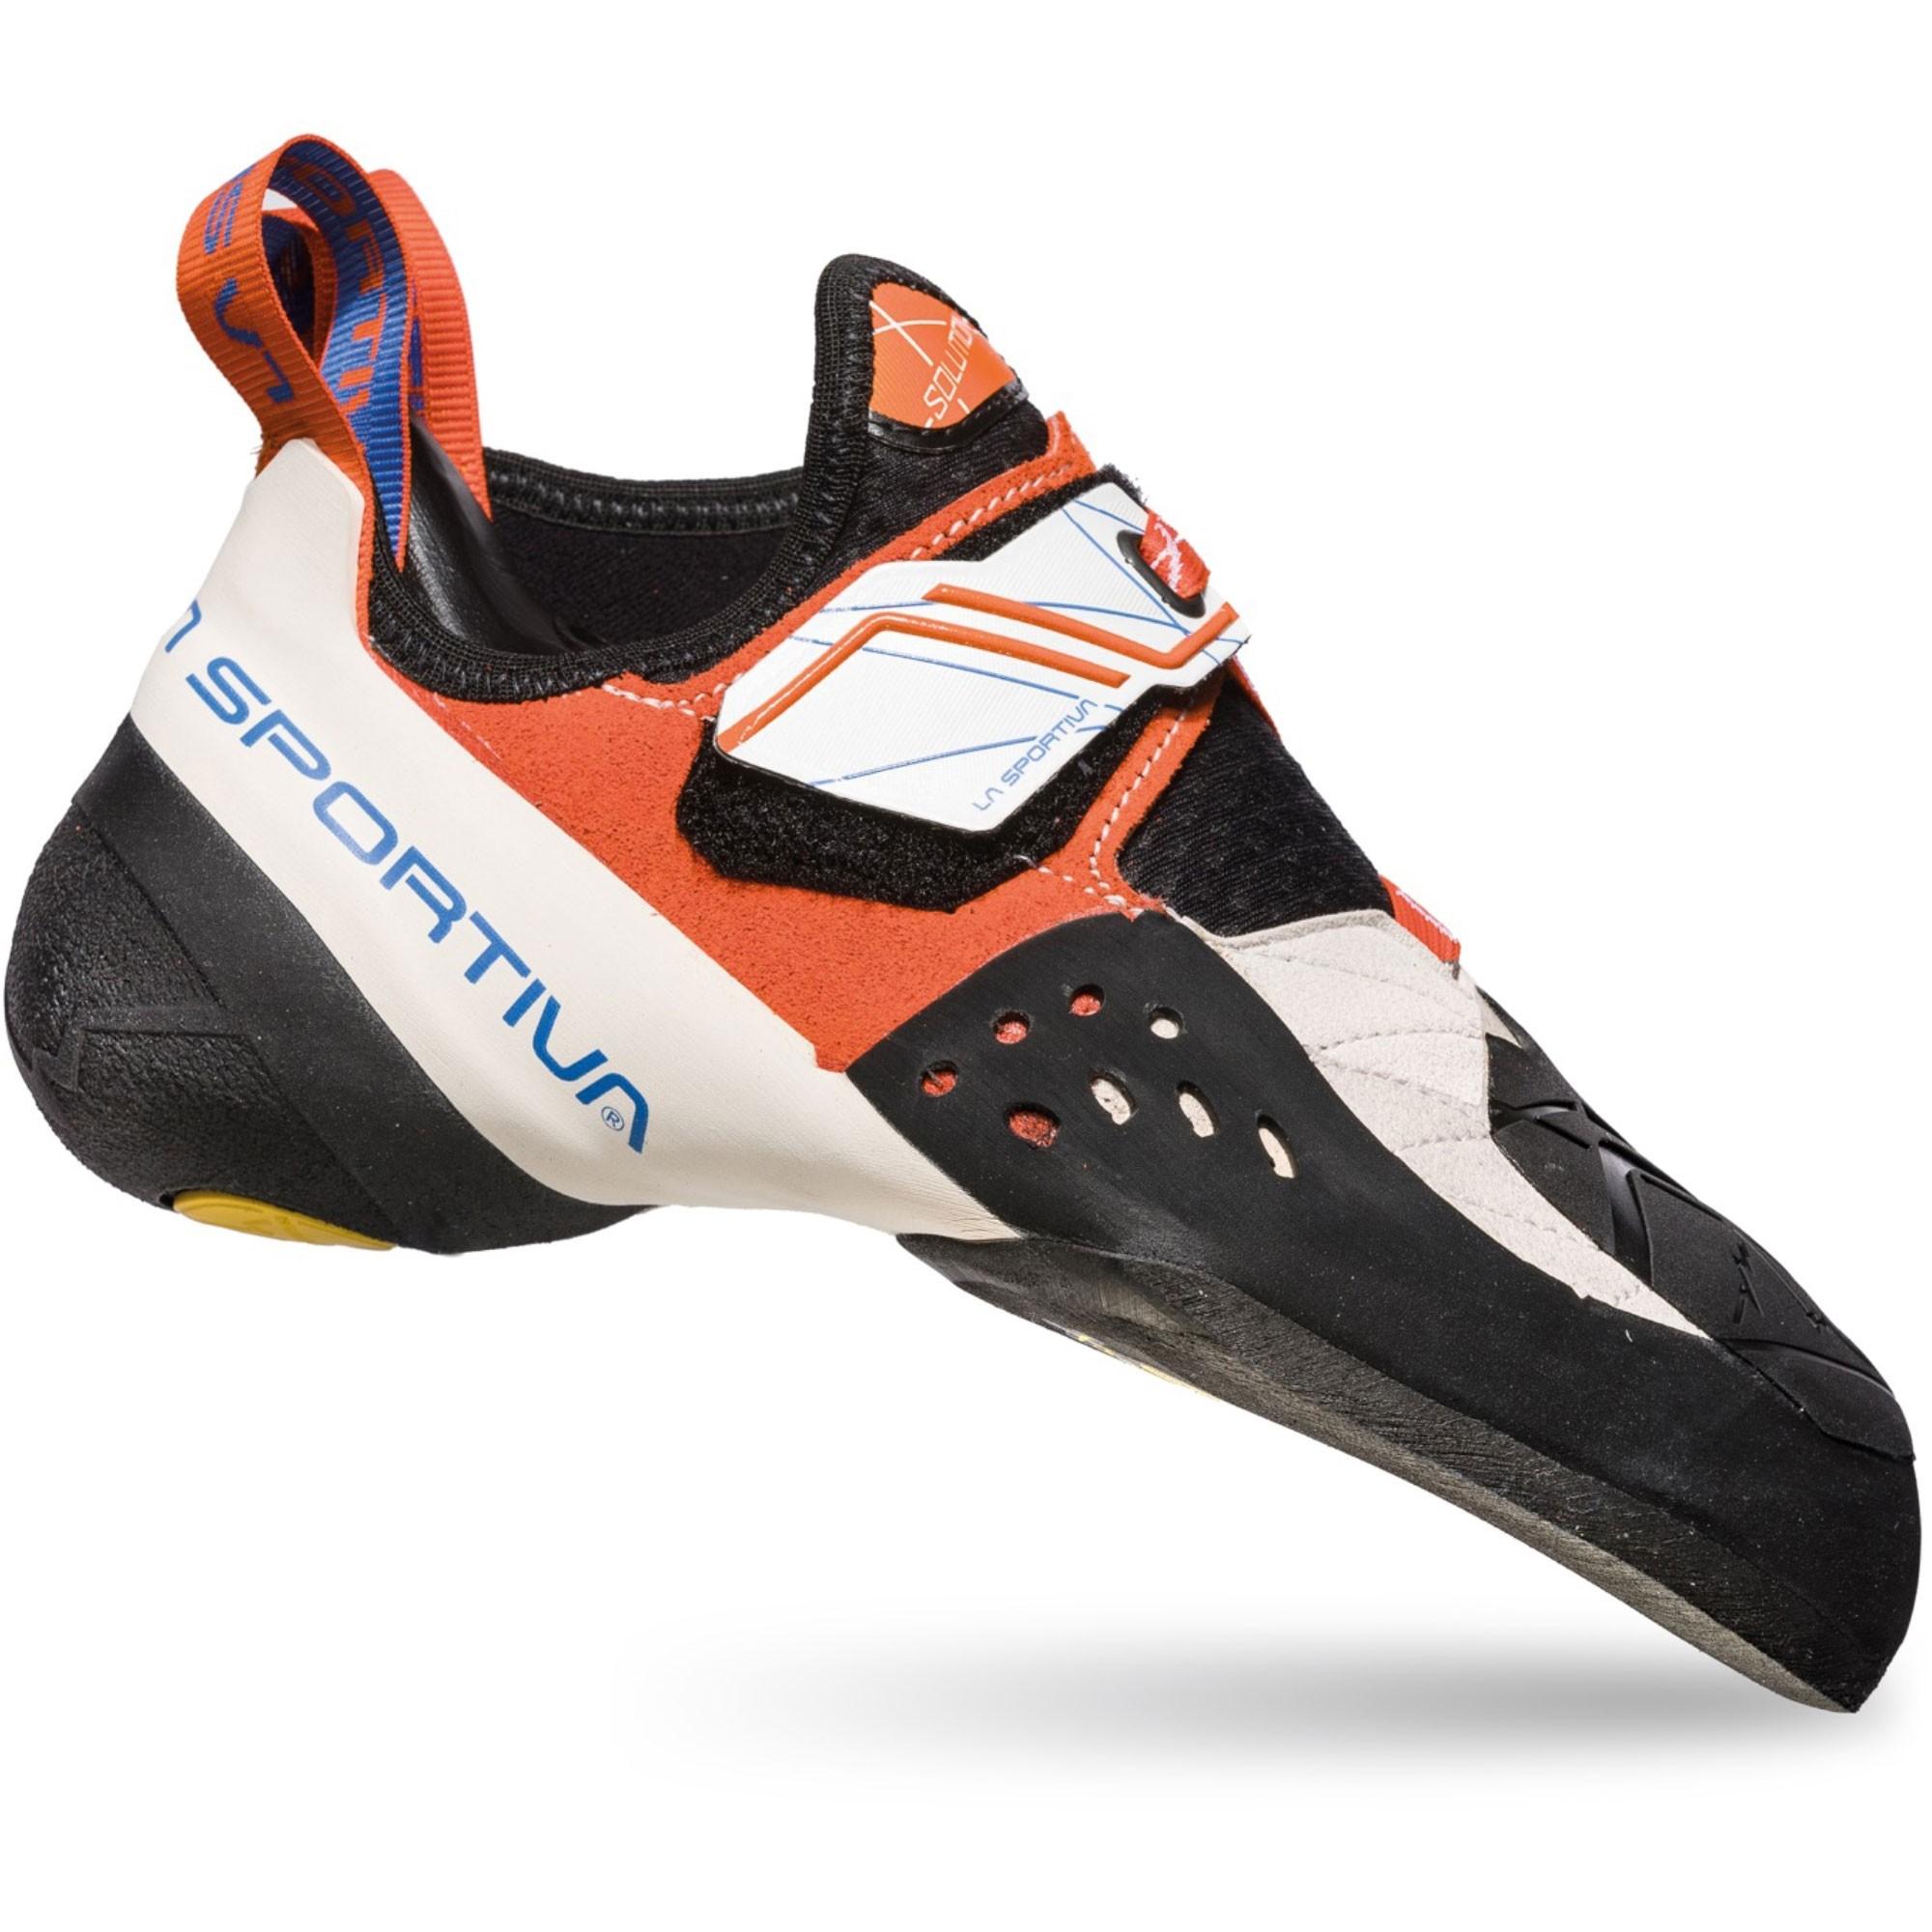 La Sportiva Solution Women's Rock Climbing Shoes